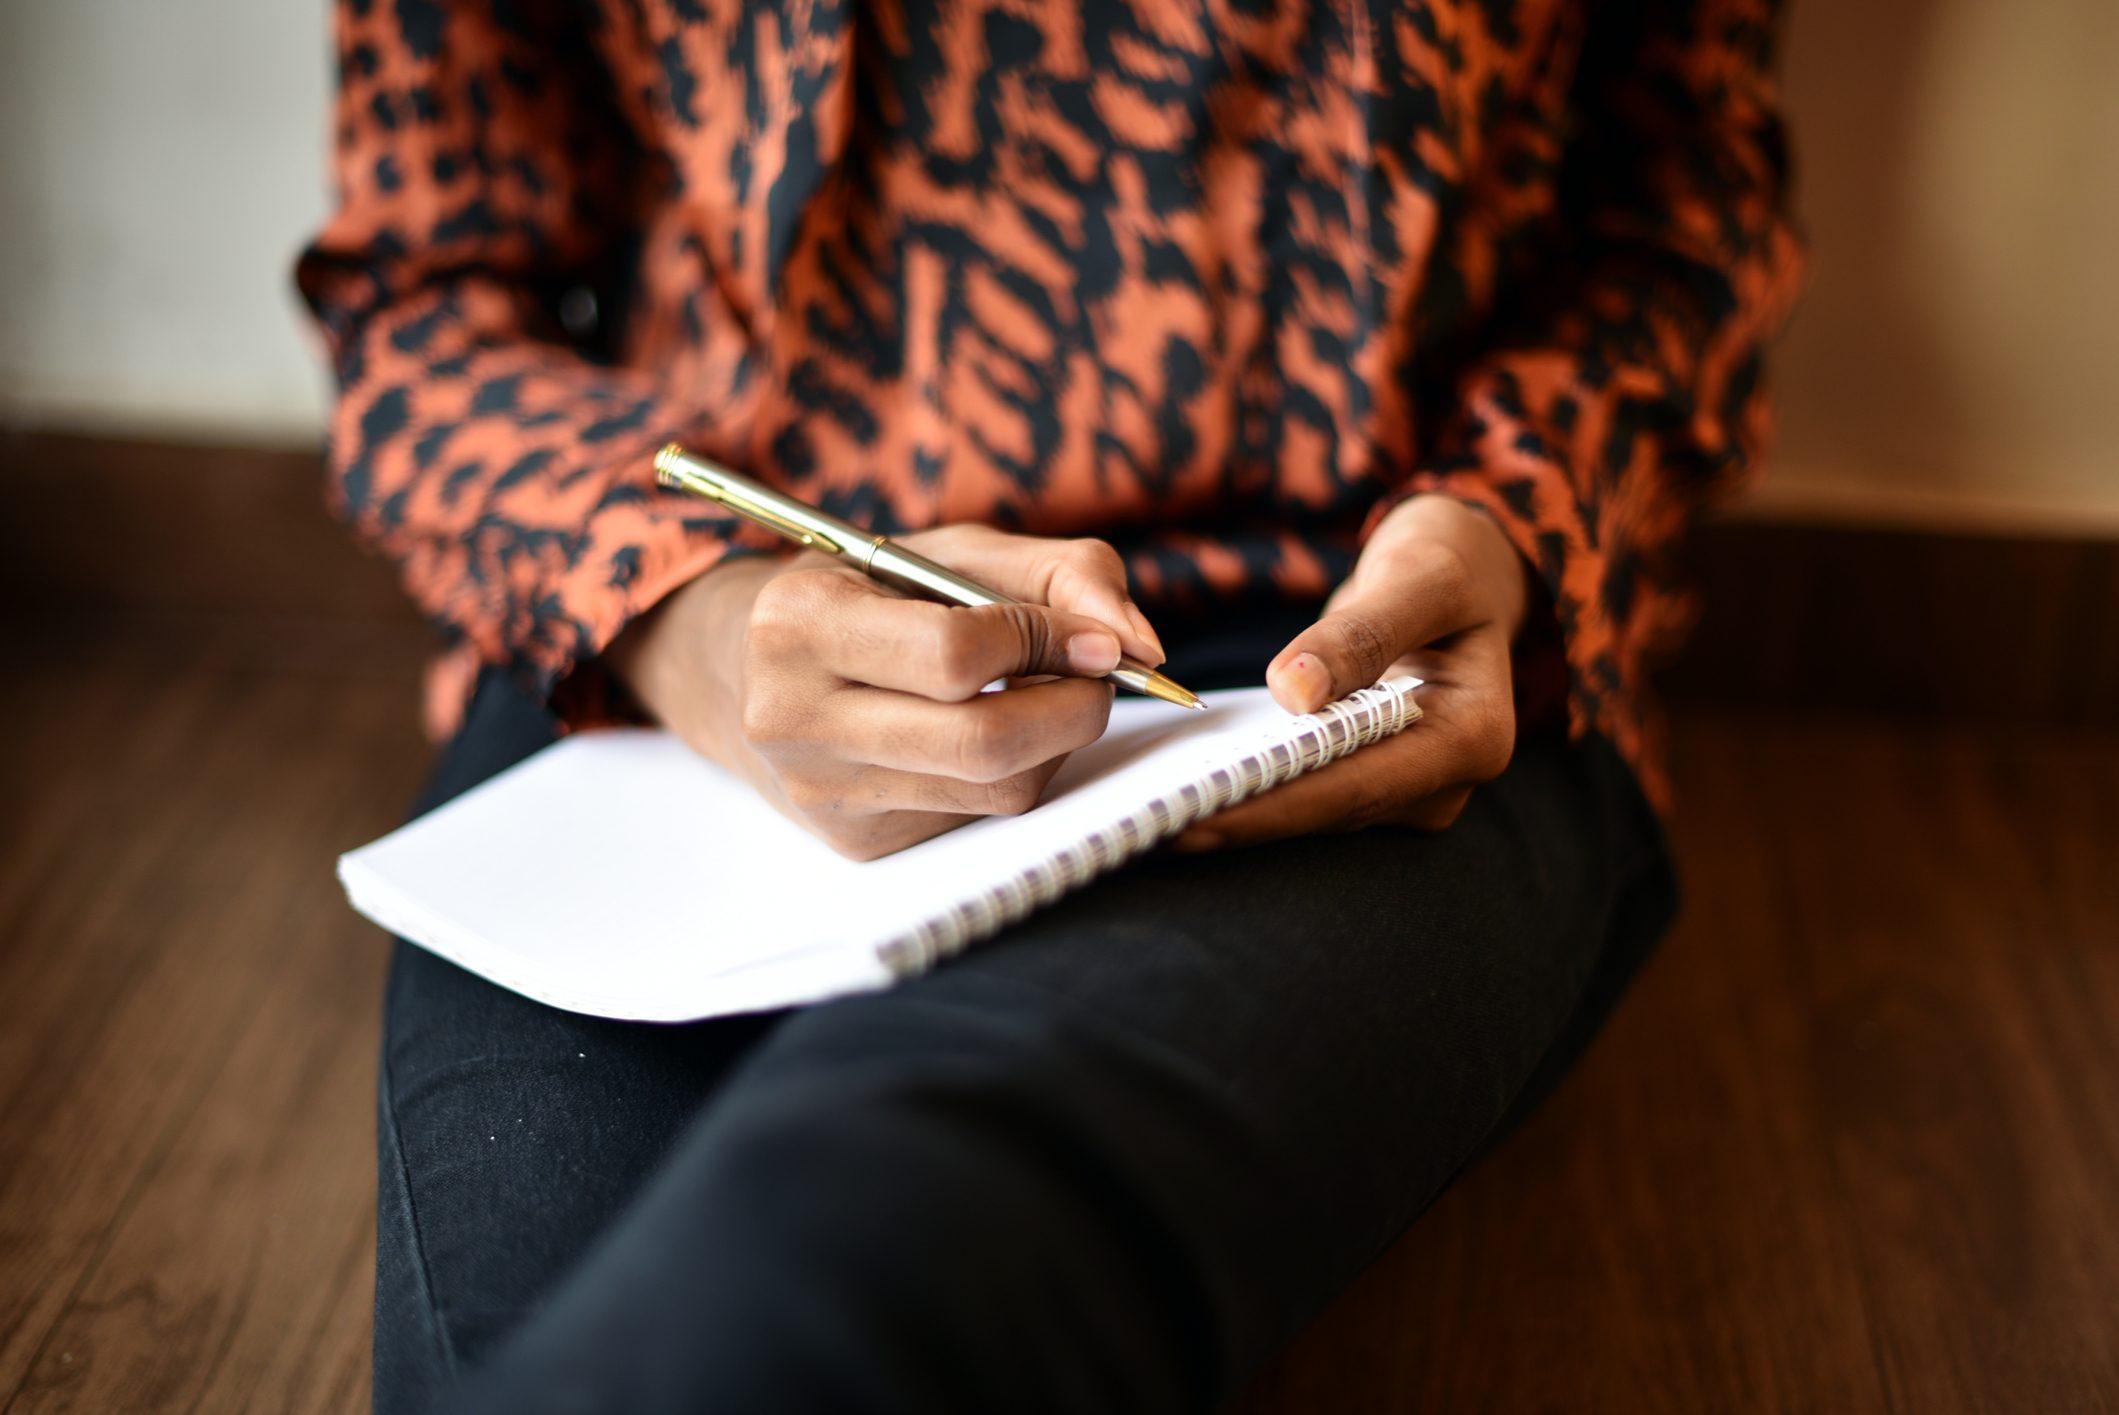 Girl writing on Notepad